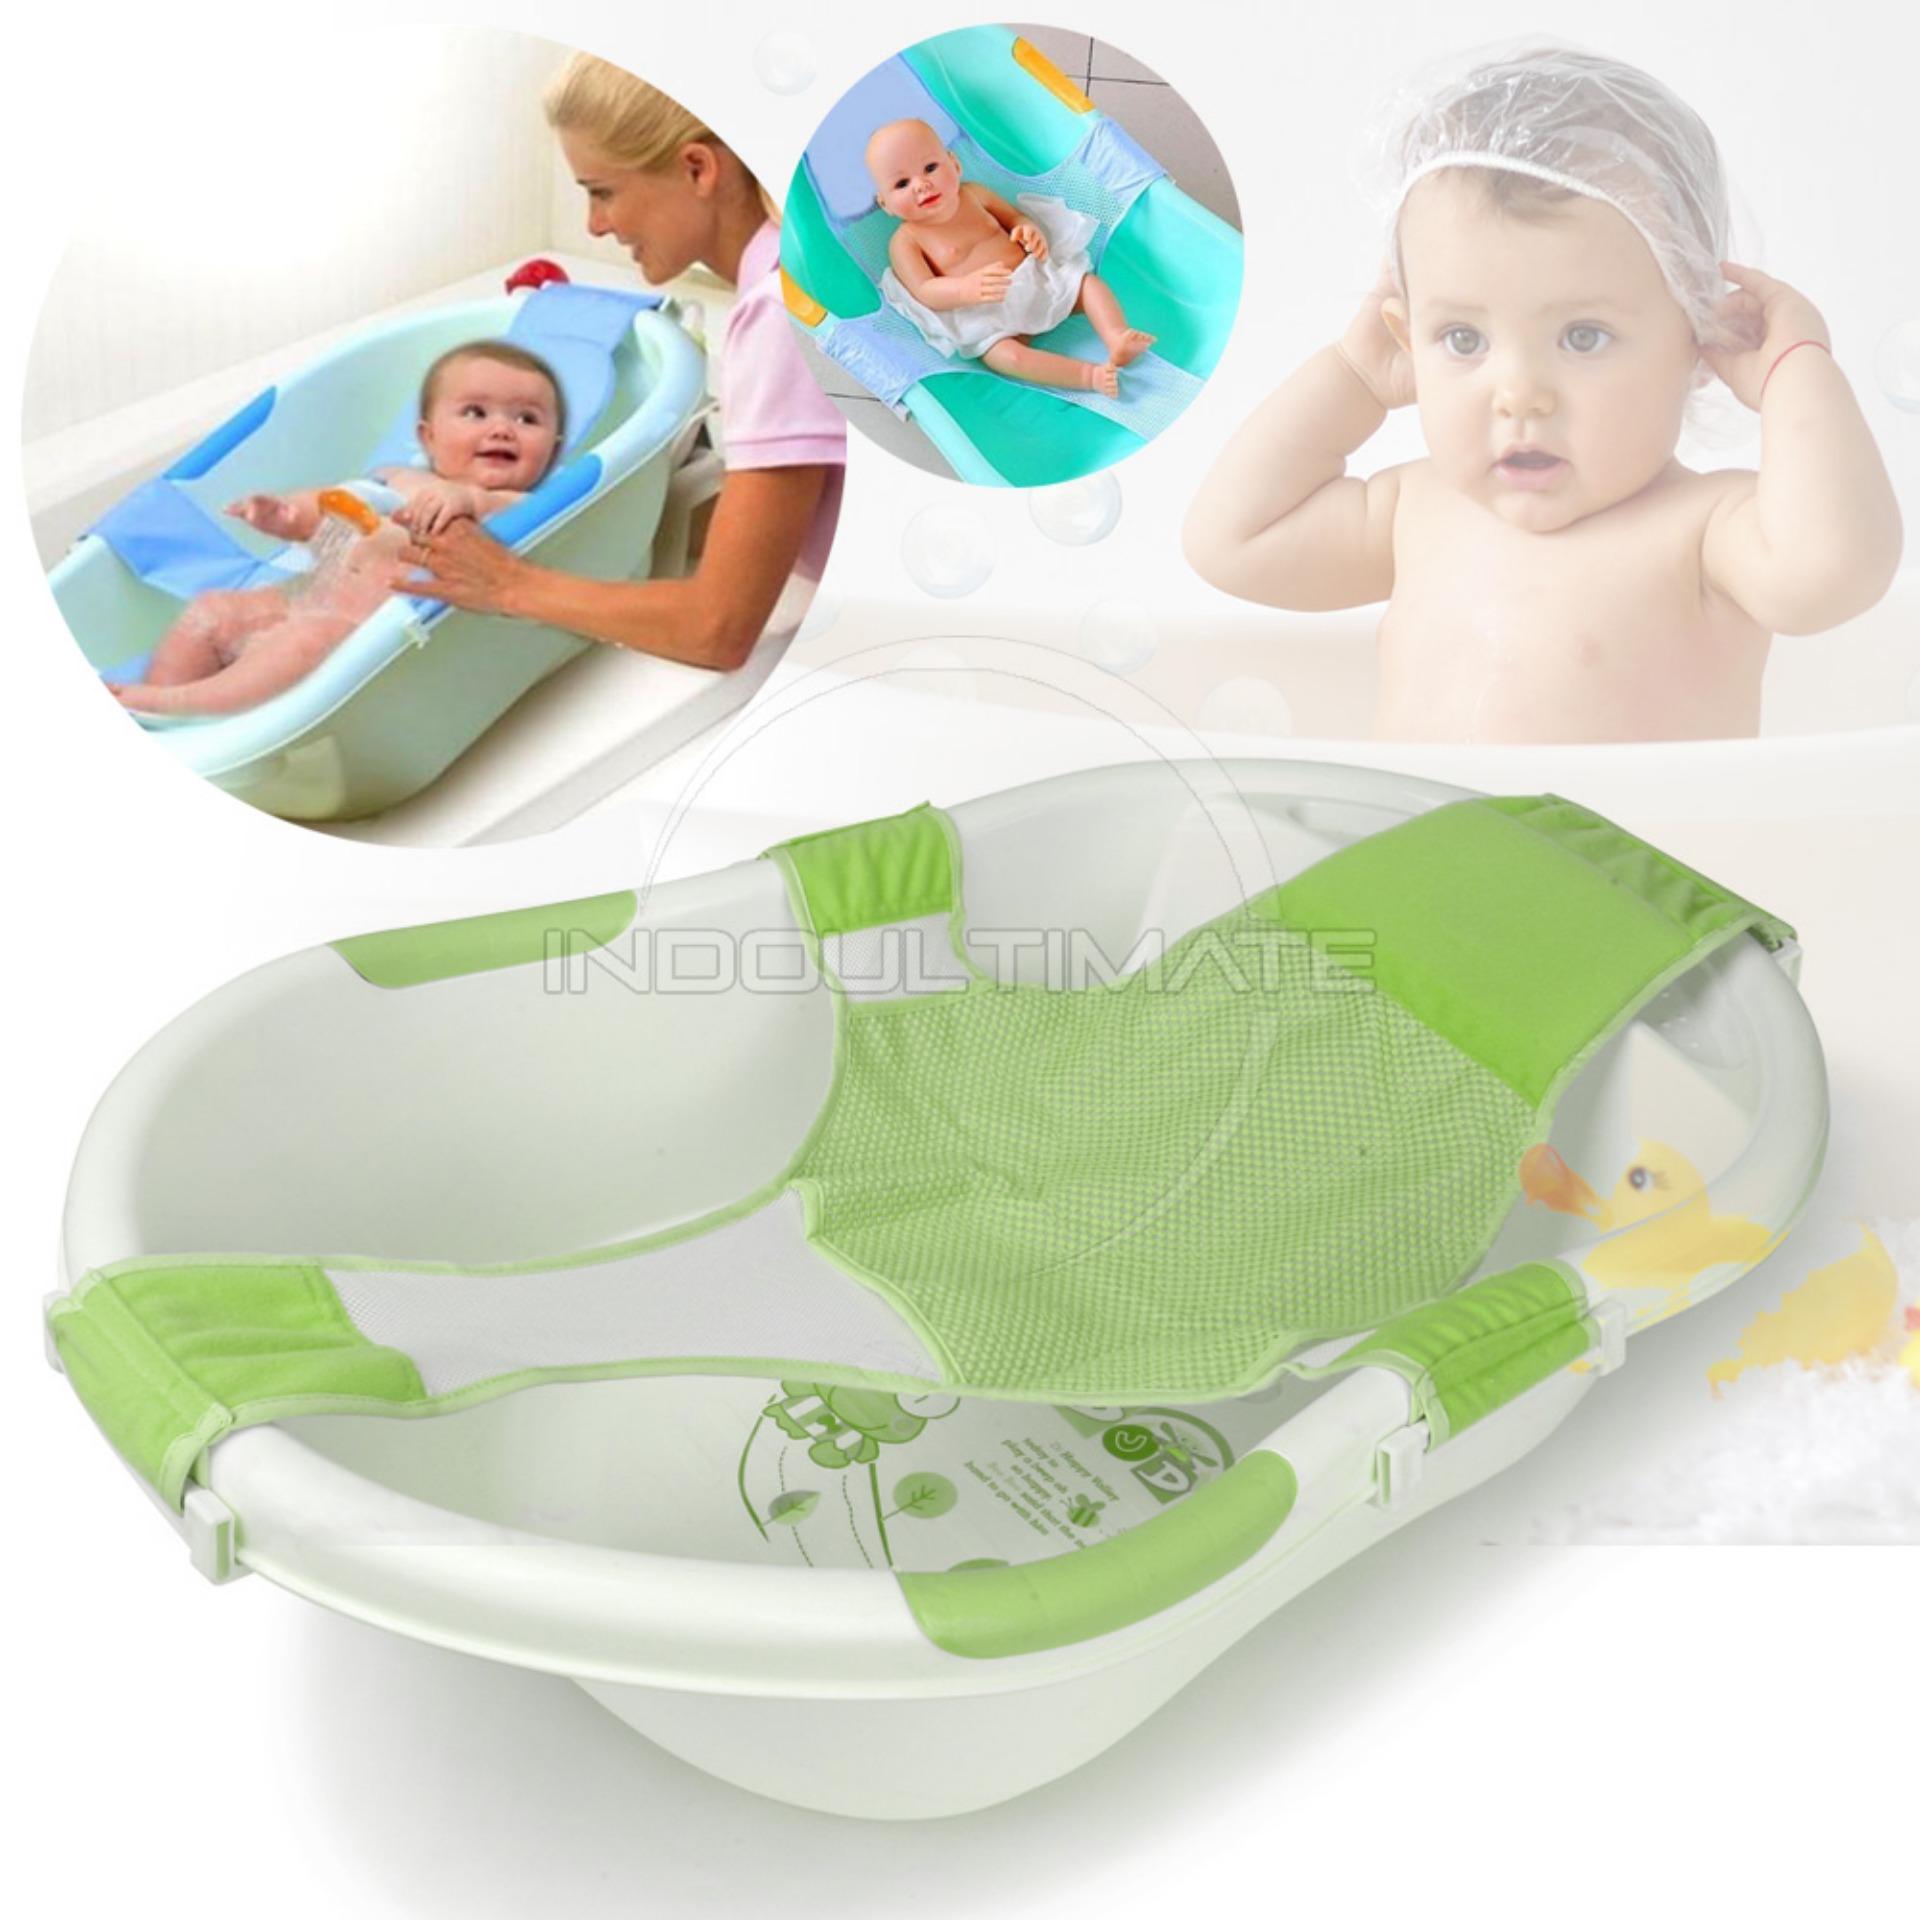 Ultimate Jaring Bak Mandi Bayi / Alas Mandi / Baby Bath Support HN-1036